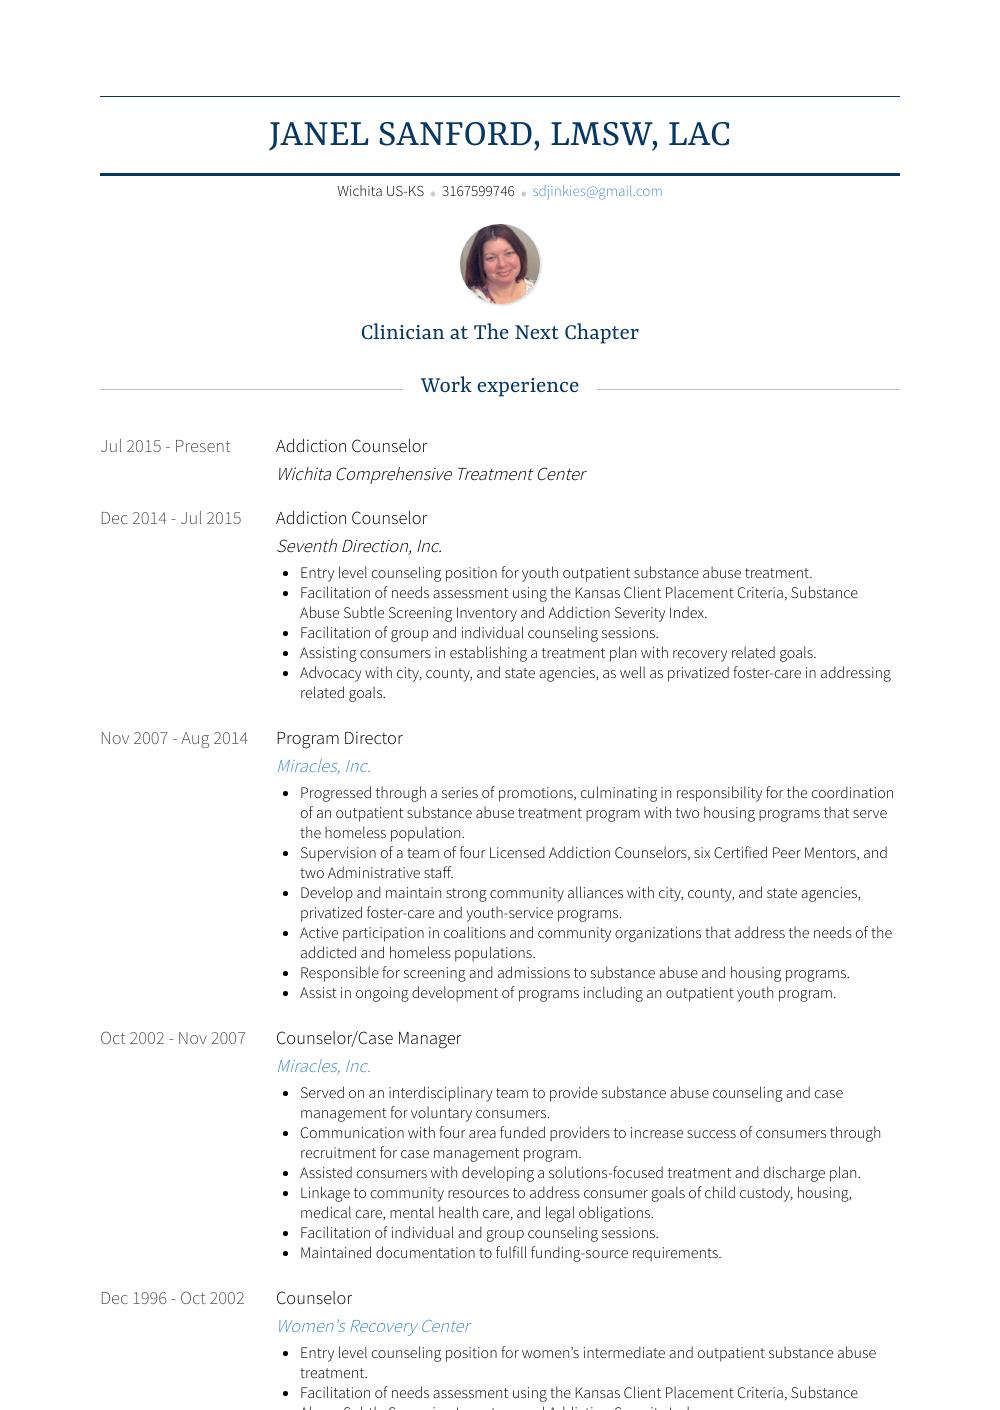 Program Director Resume Sample